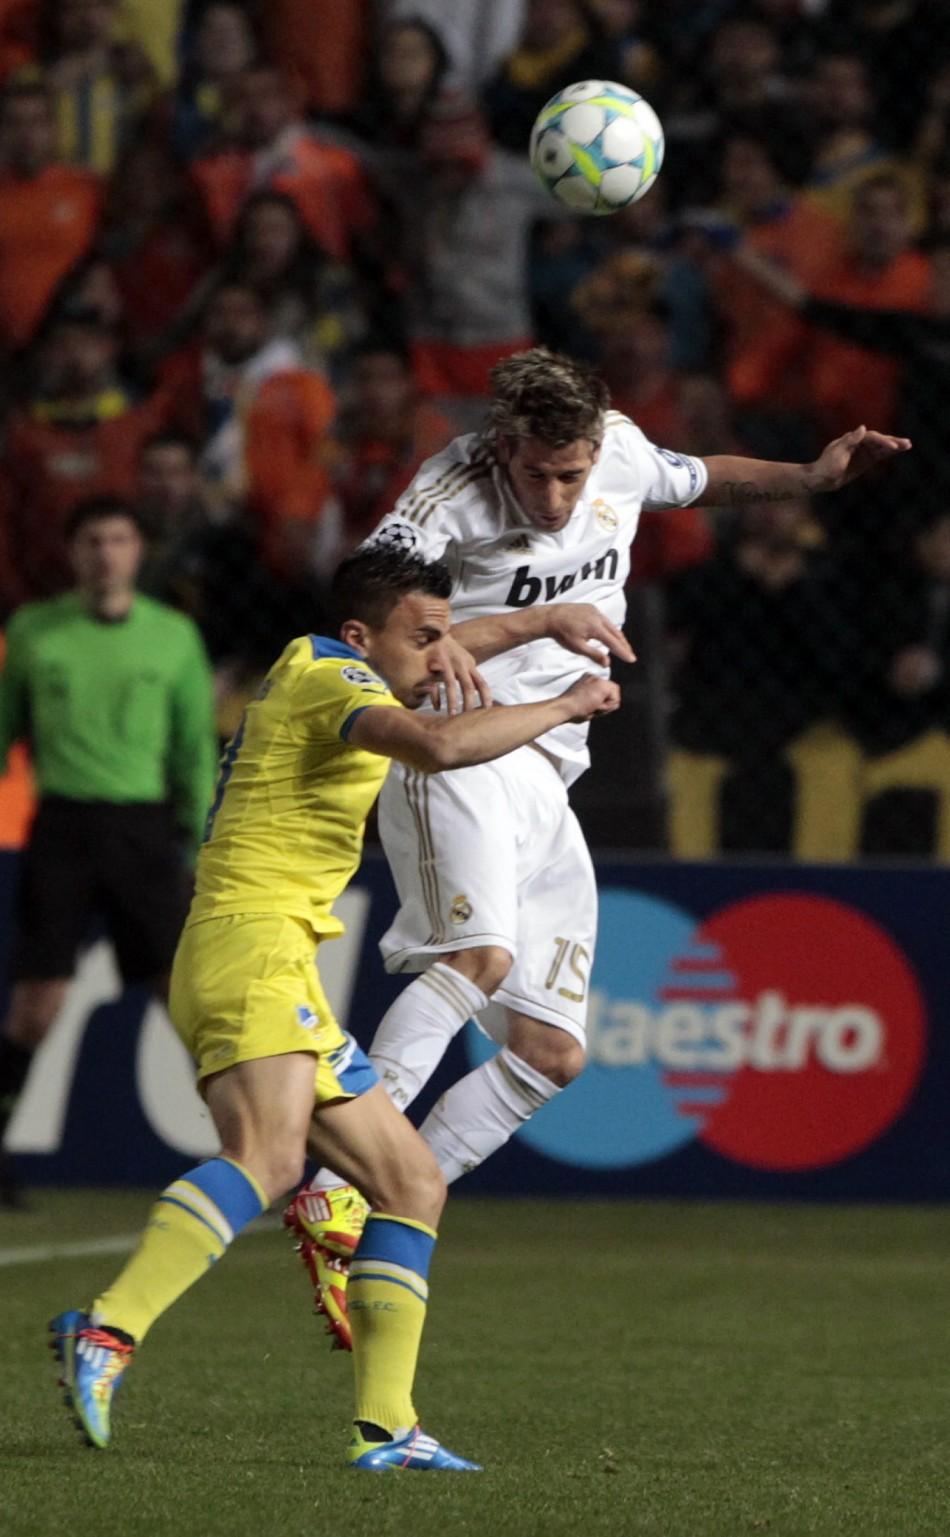 Soccer - APOEL v Real Madrid - Champions League - First Leg - Quarter-Finals- Neo GSP Stadium